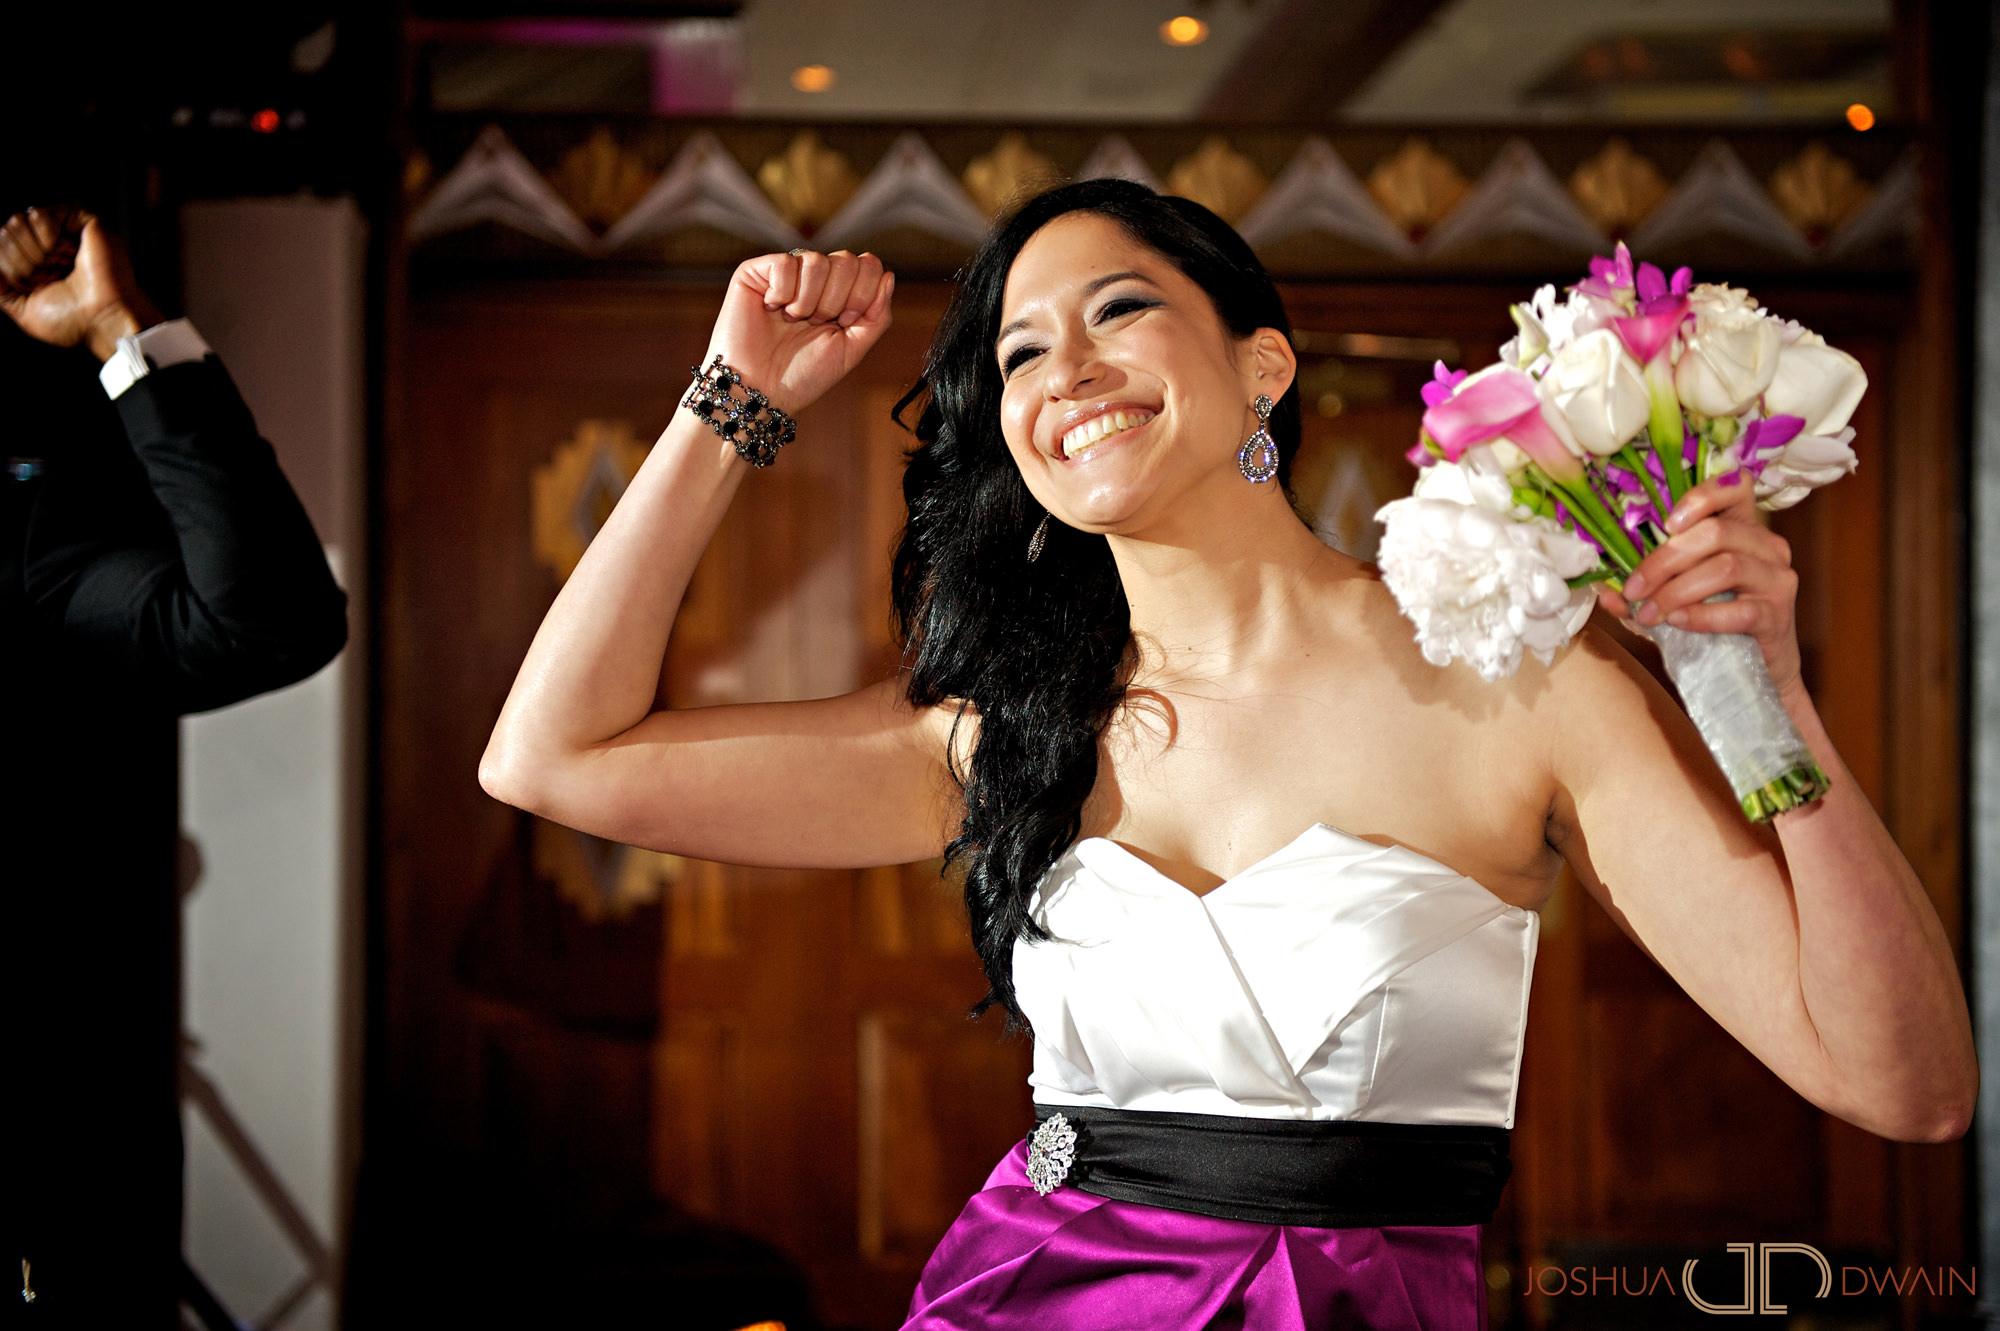 carolina-hector-026-chateau-briandlong-island-new-york-wedding-photographer-joshua-dwain-2011-05-13_ch_0701